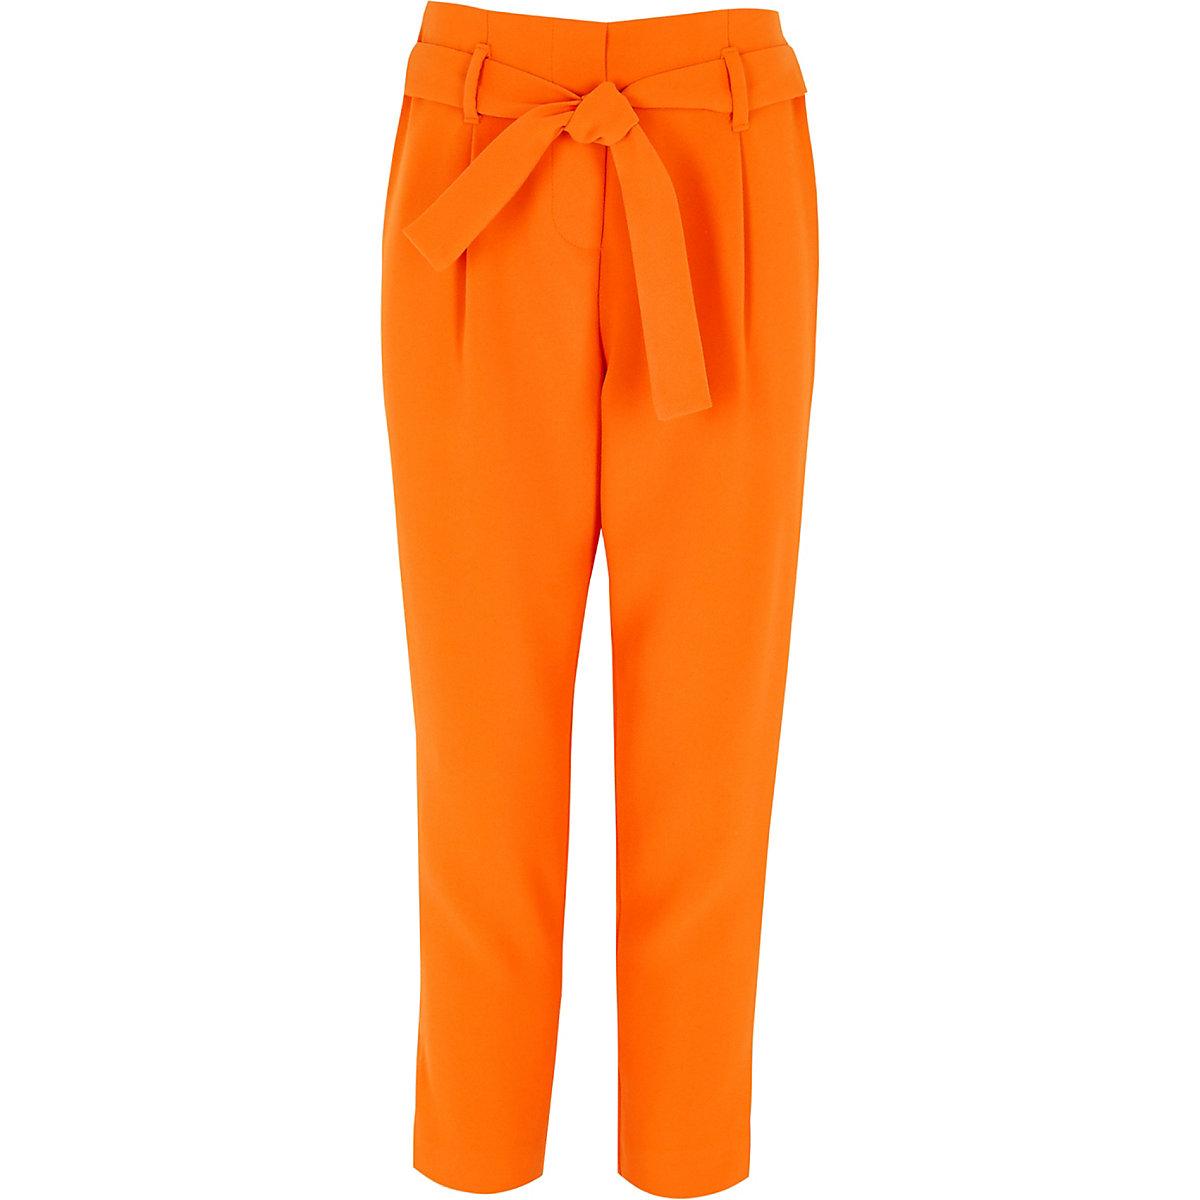 Girls orange tie waist tapered pants